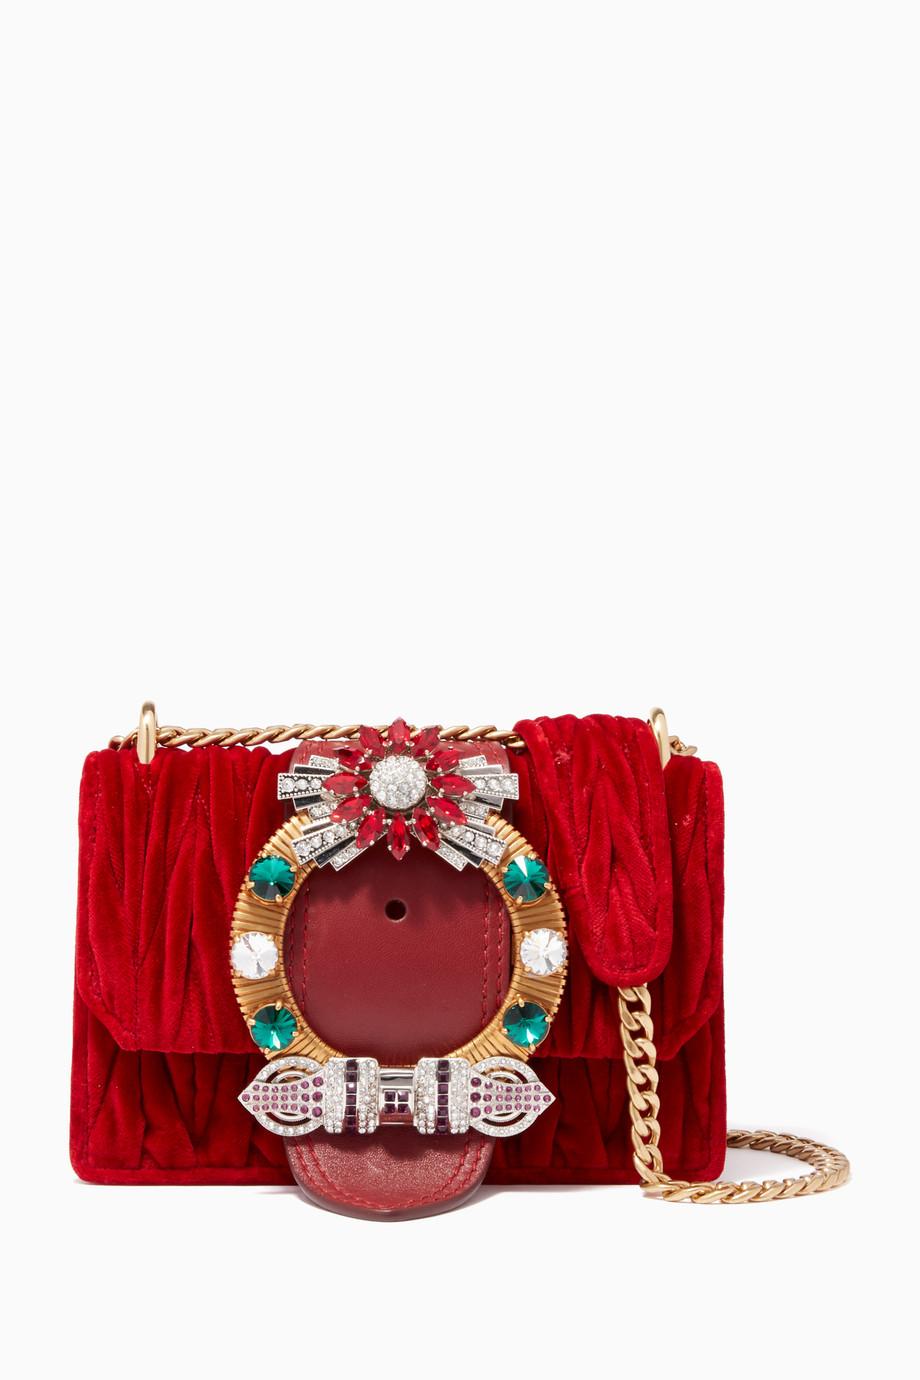 d55639195917 Shop Miu Miu Red Red Velvet Embellished Matelassé Cross-Body Bag for ...